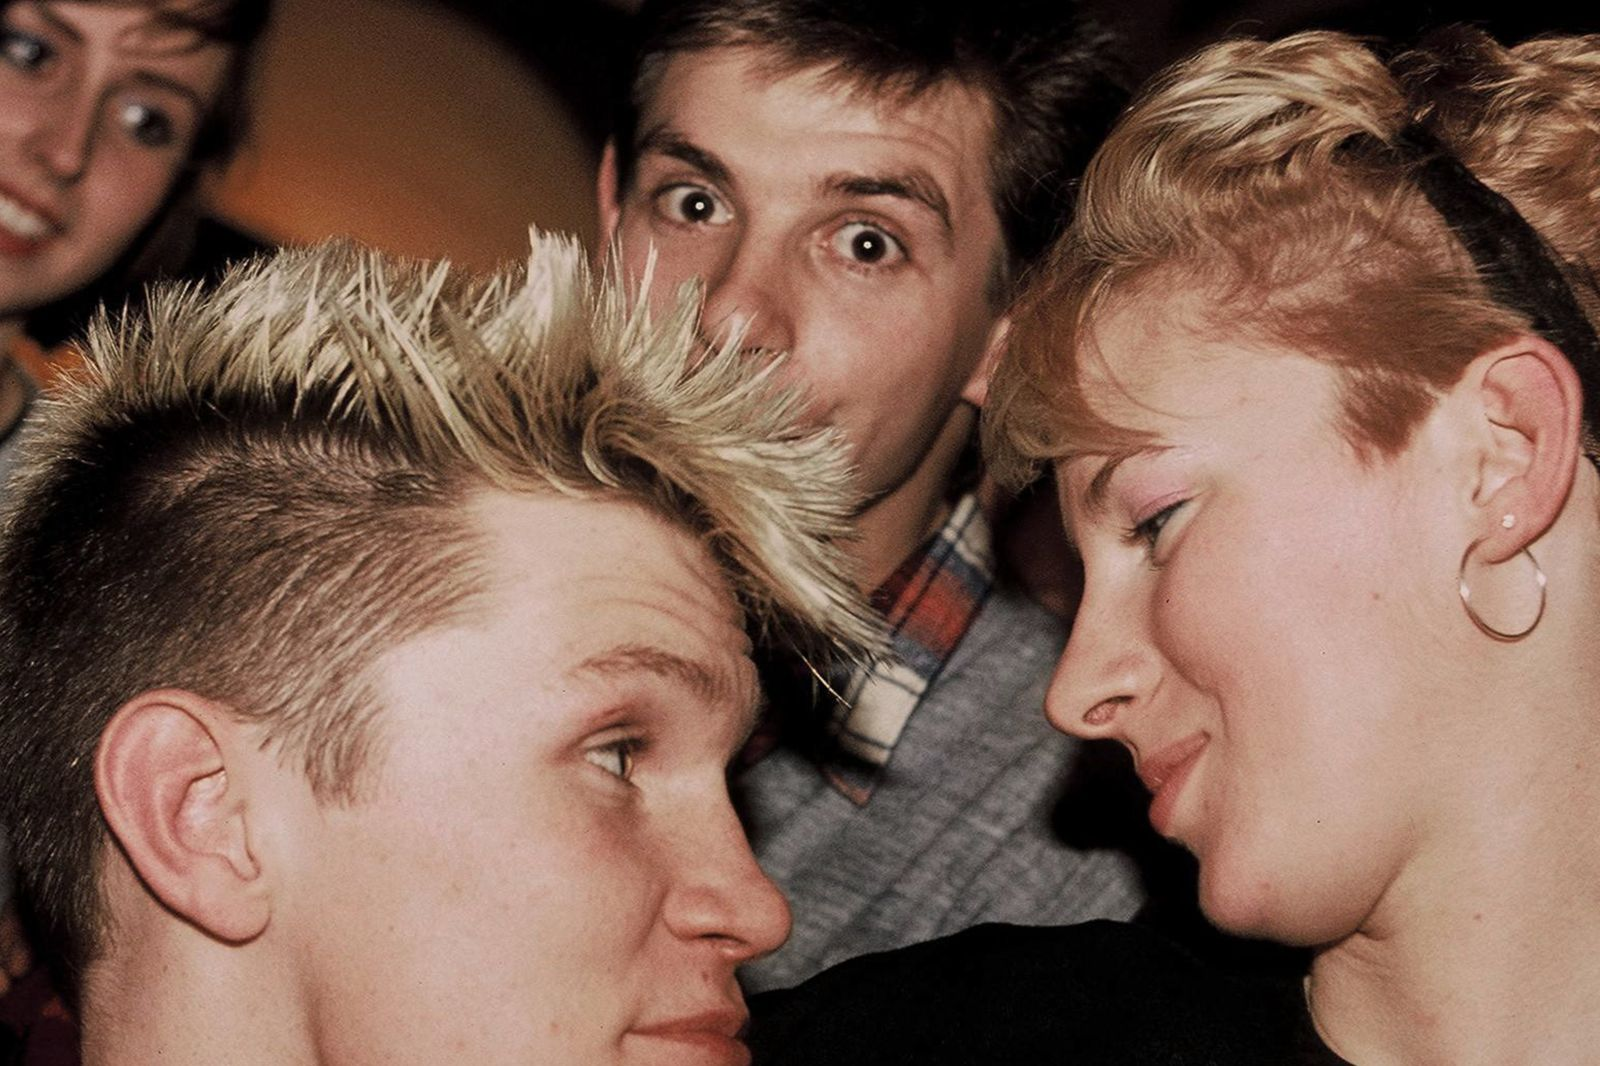 Teenagers having fun in the pub,xmas eve, west London 1983.